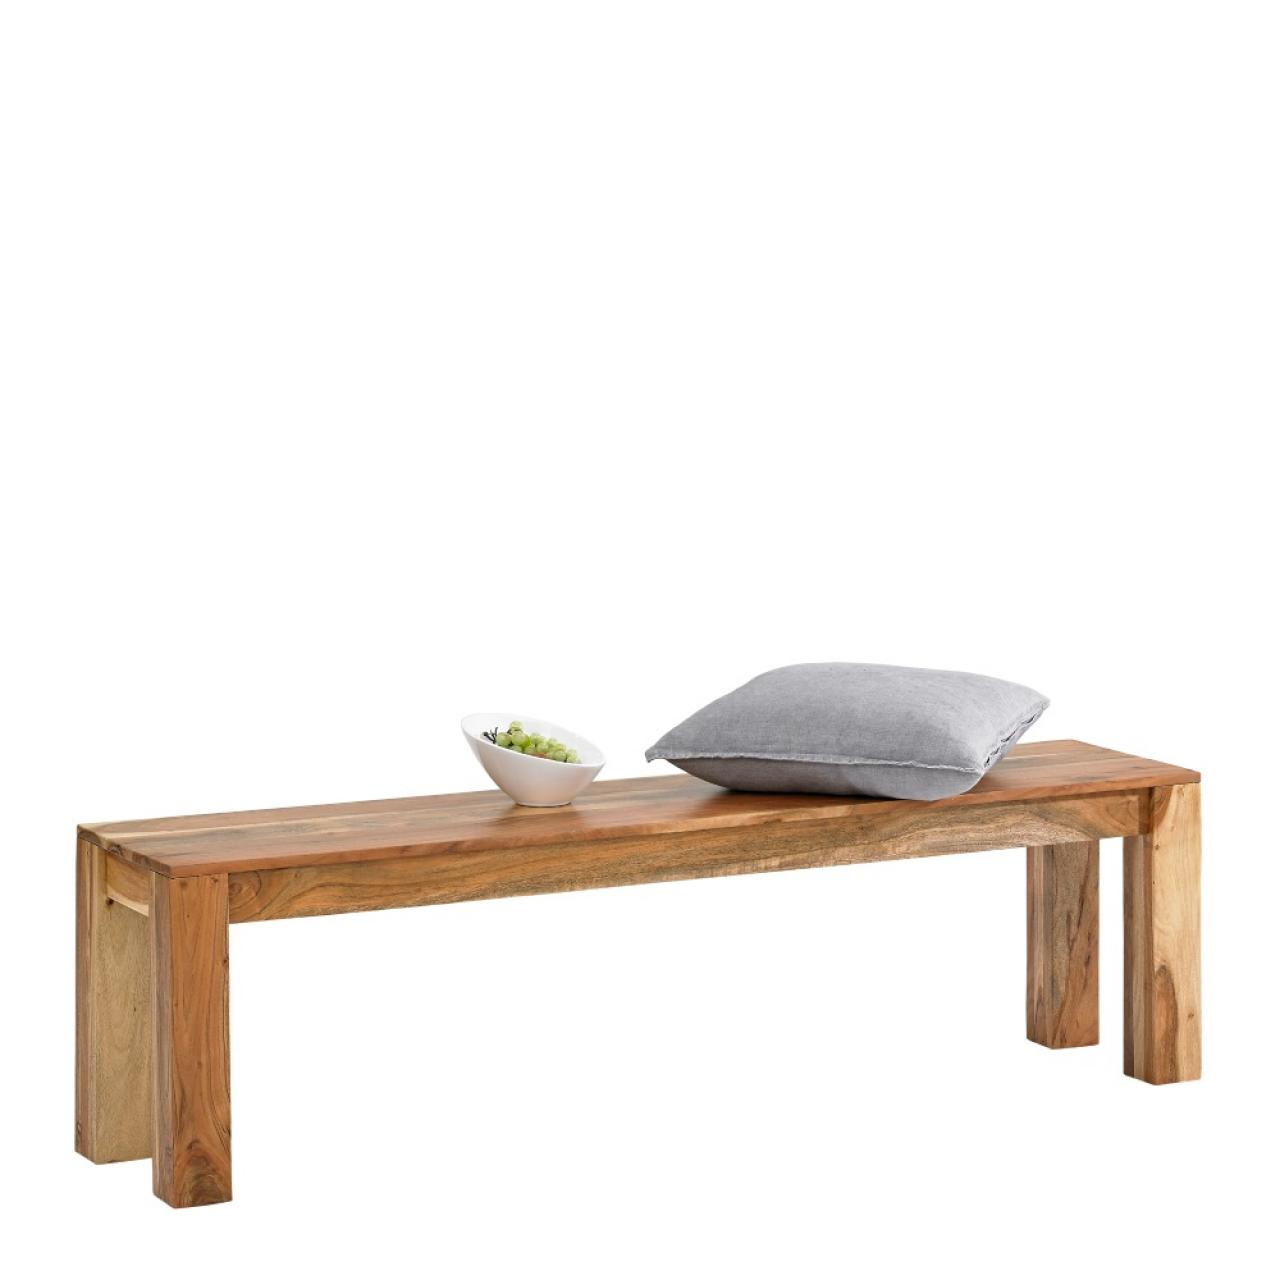 Bank Vision 2830 Akazie Holz Massiv Sitzbank Bank Küche Esszimmer